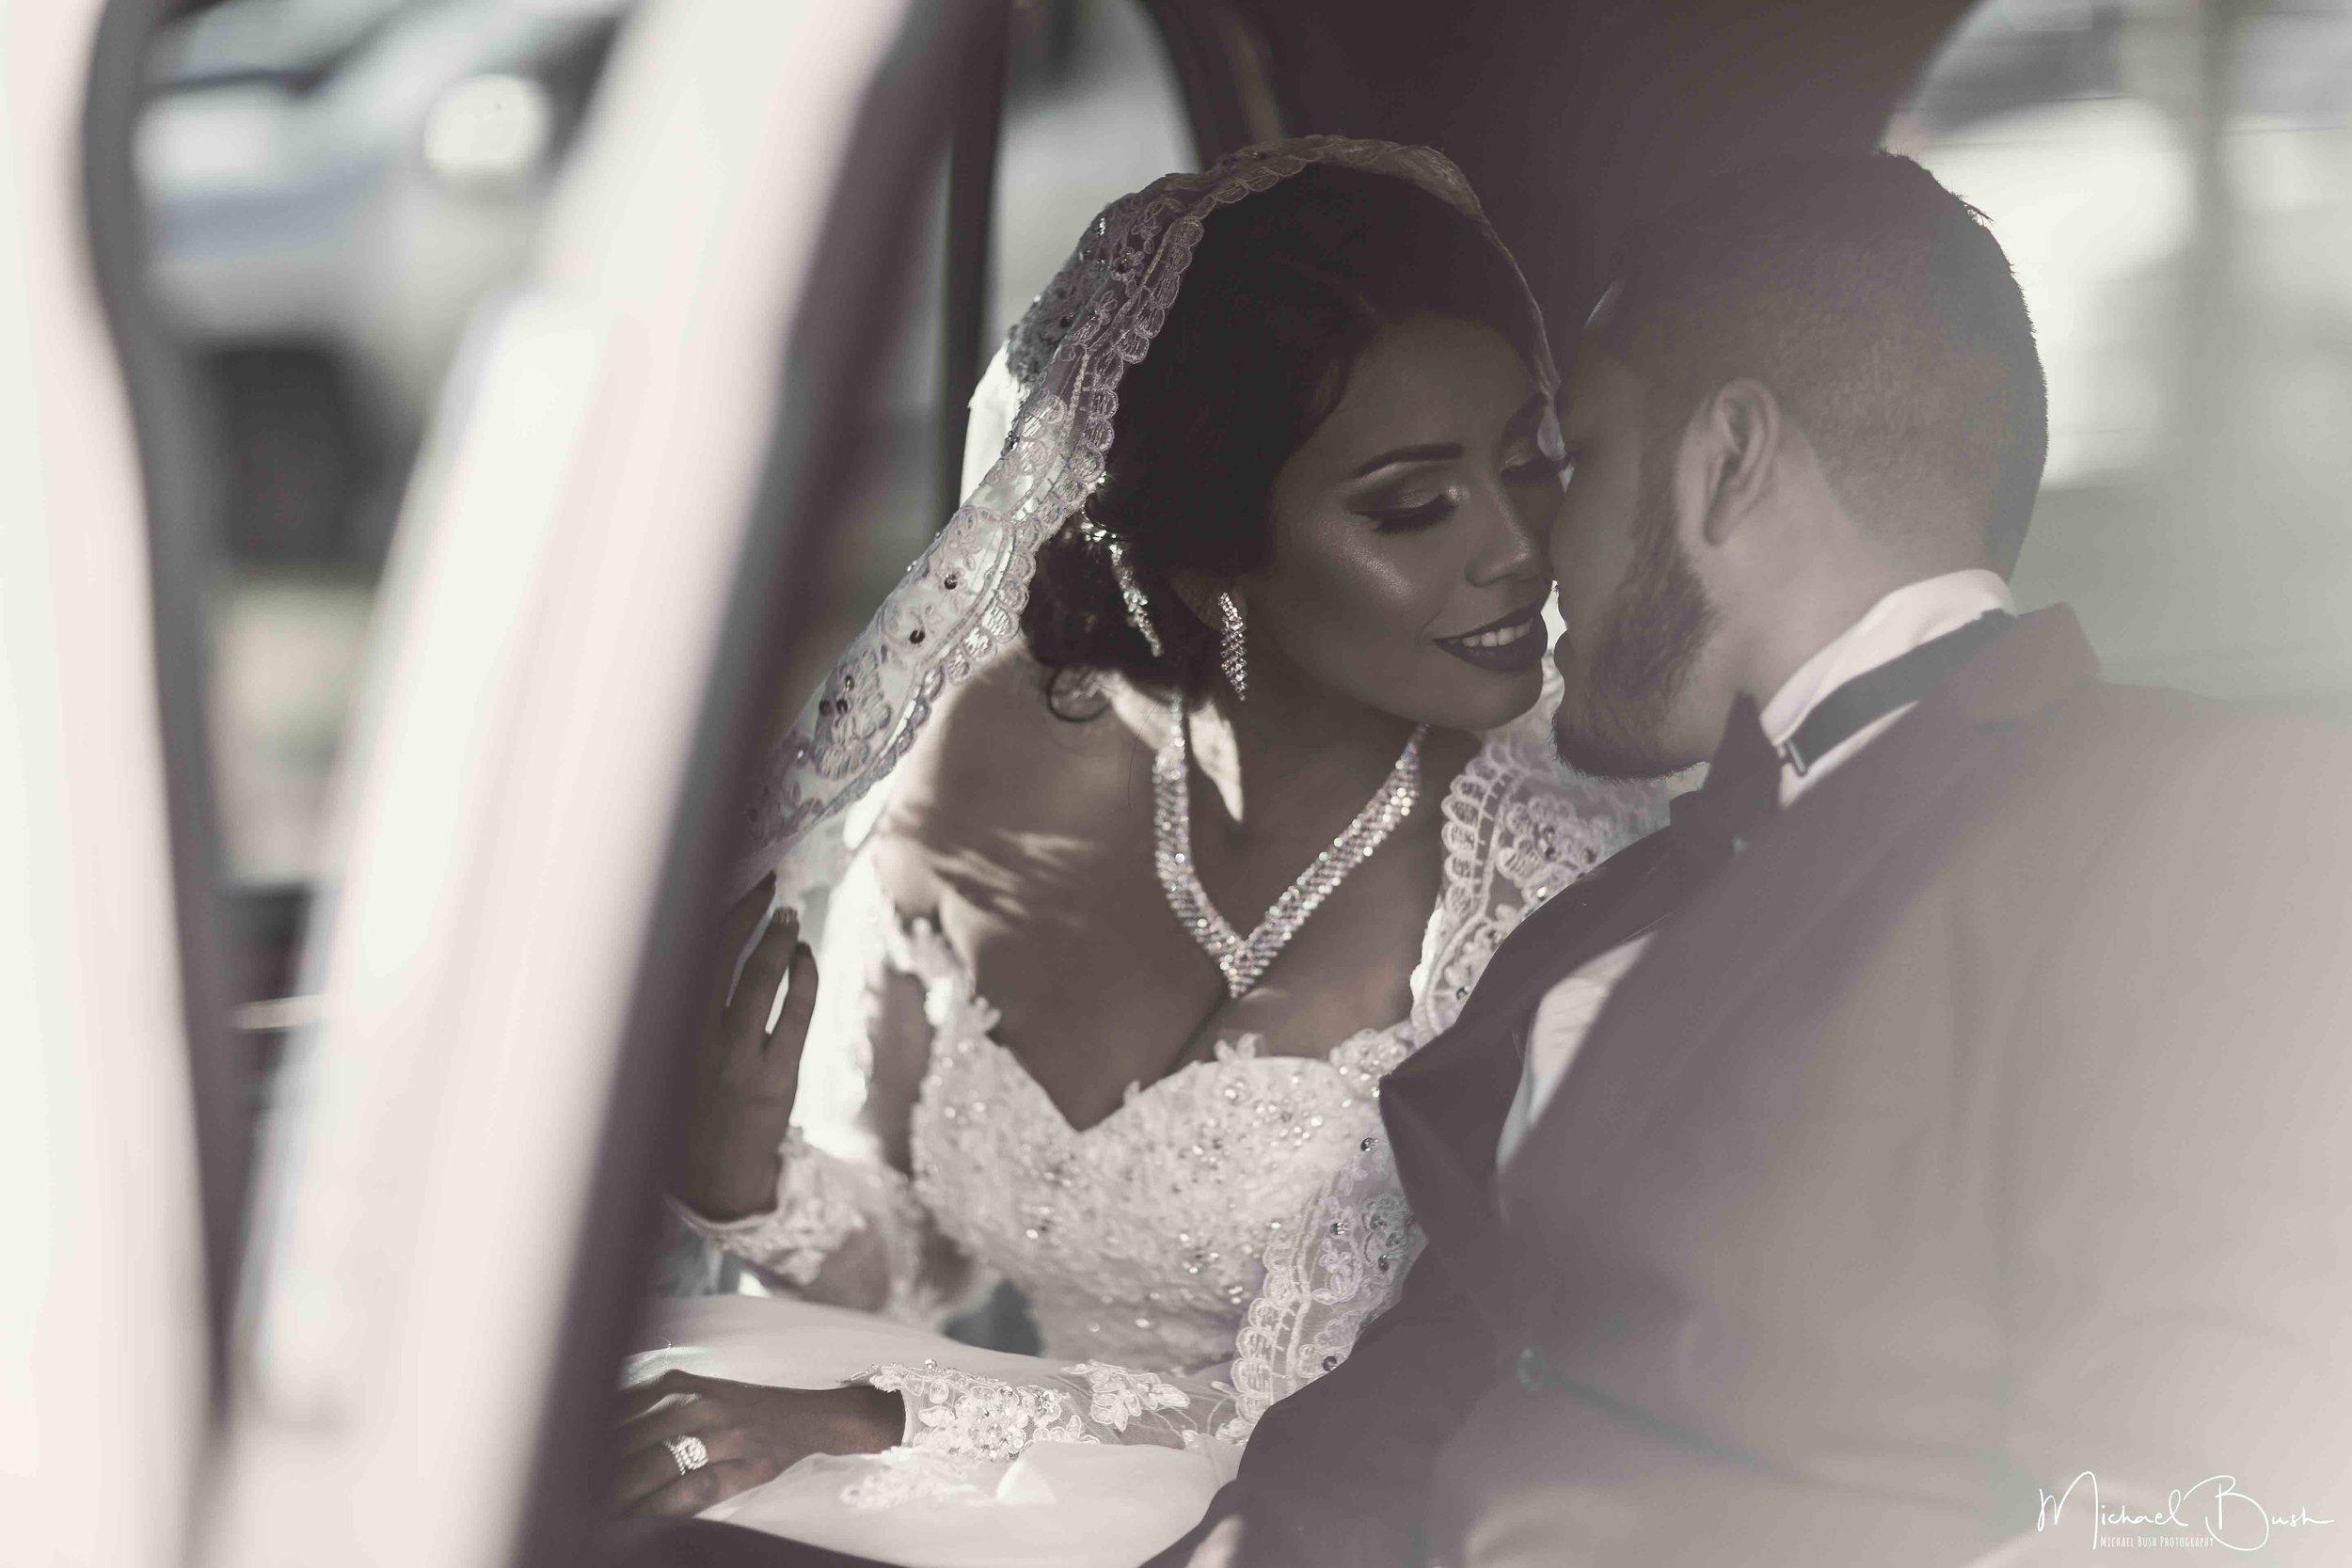 Wedding-Details-Bride-Fort Worth-colors-Ceremony-weddingceremony-brides-groom-ido-church-fashion-bride&groom.jpg